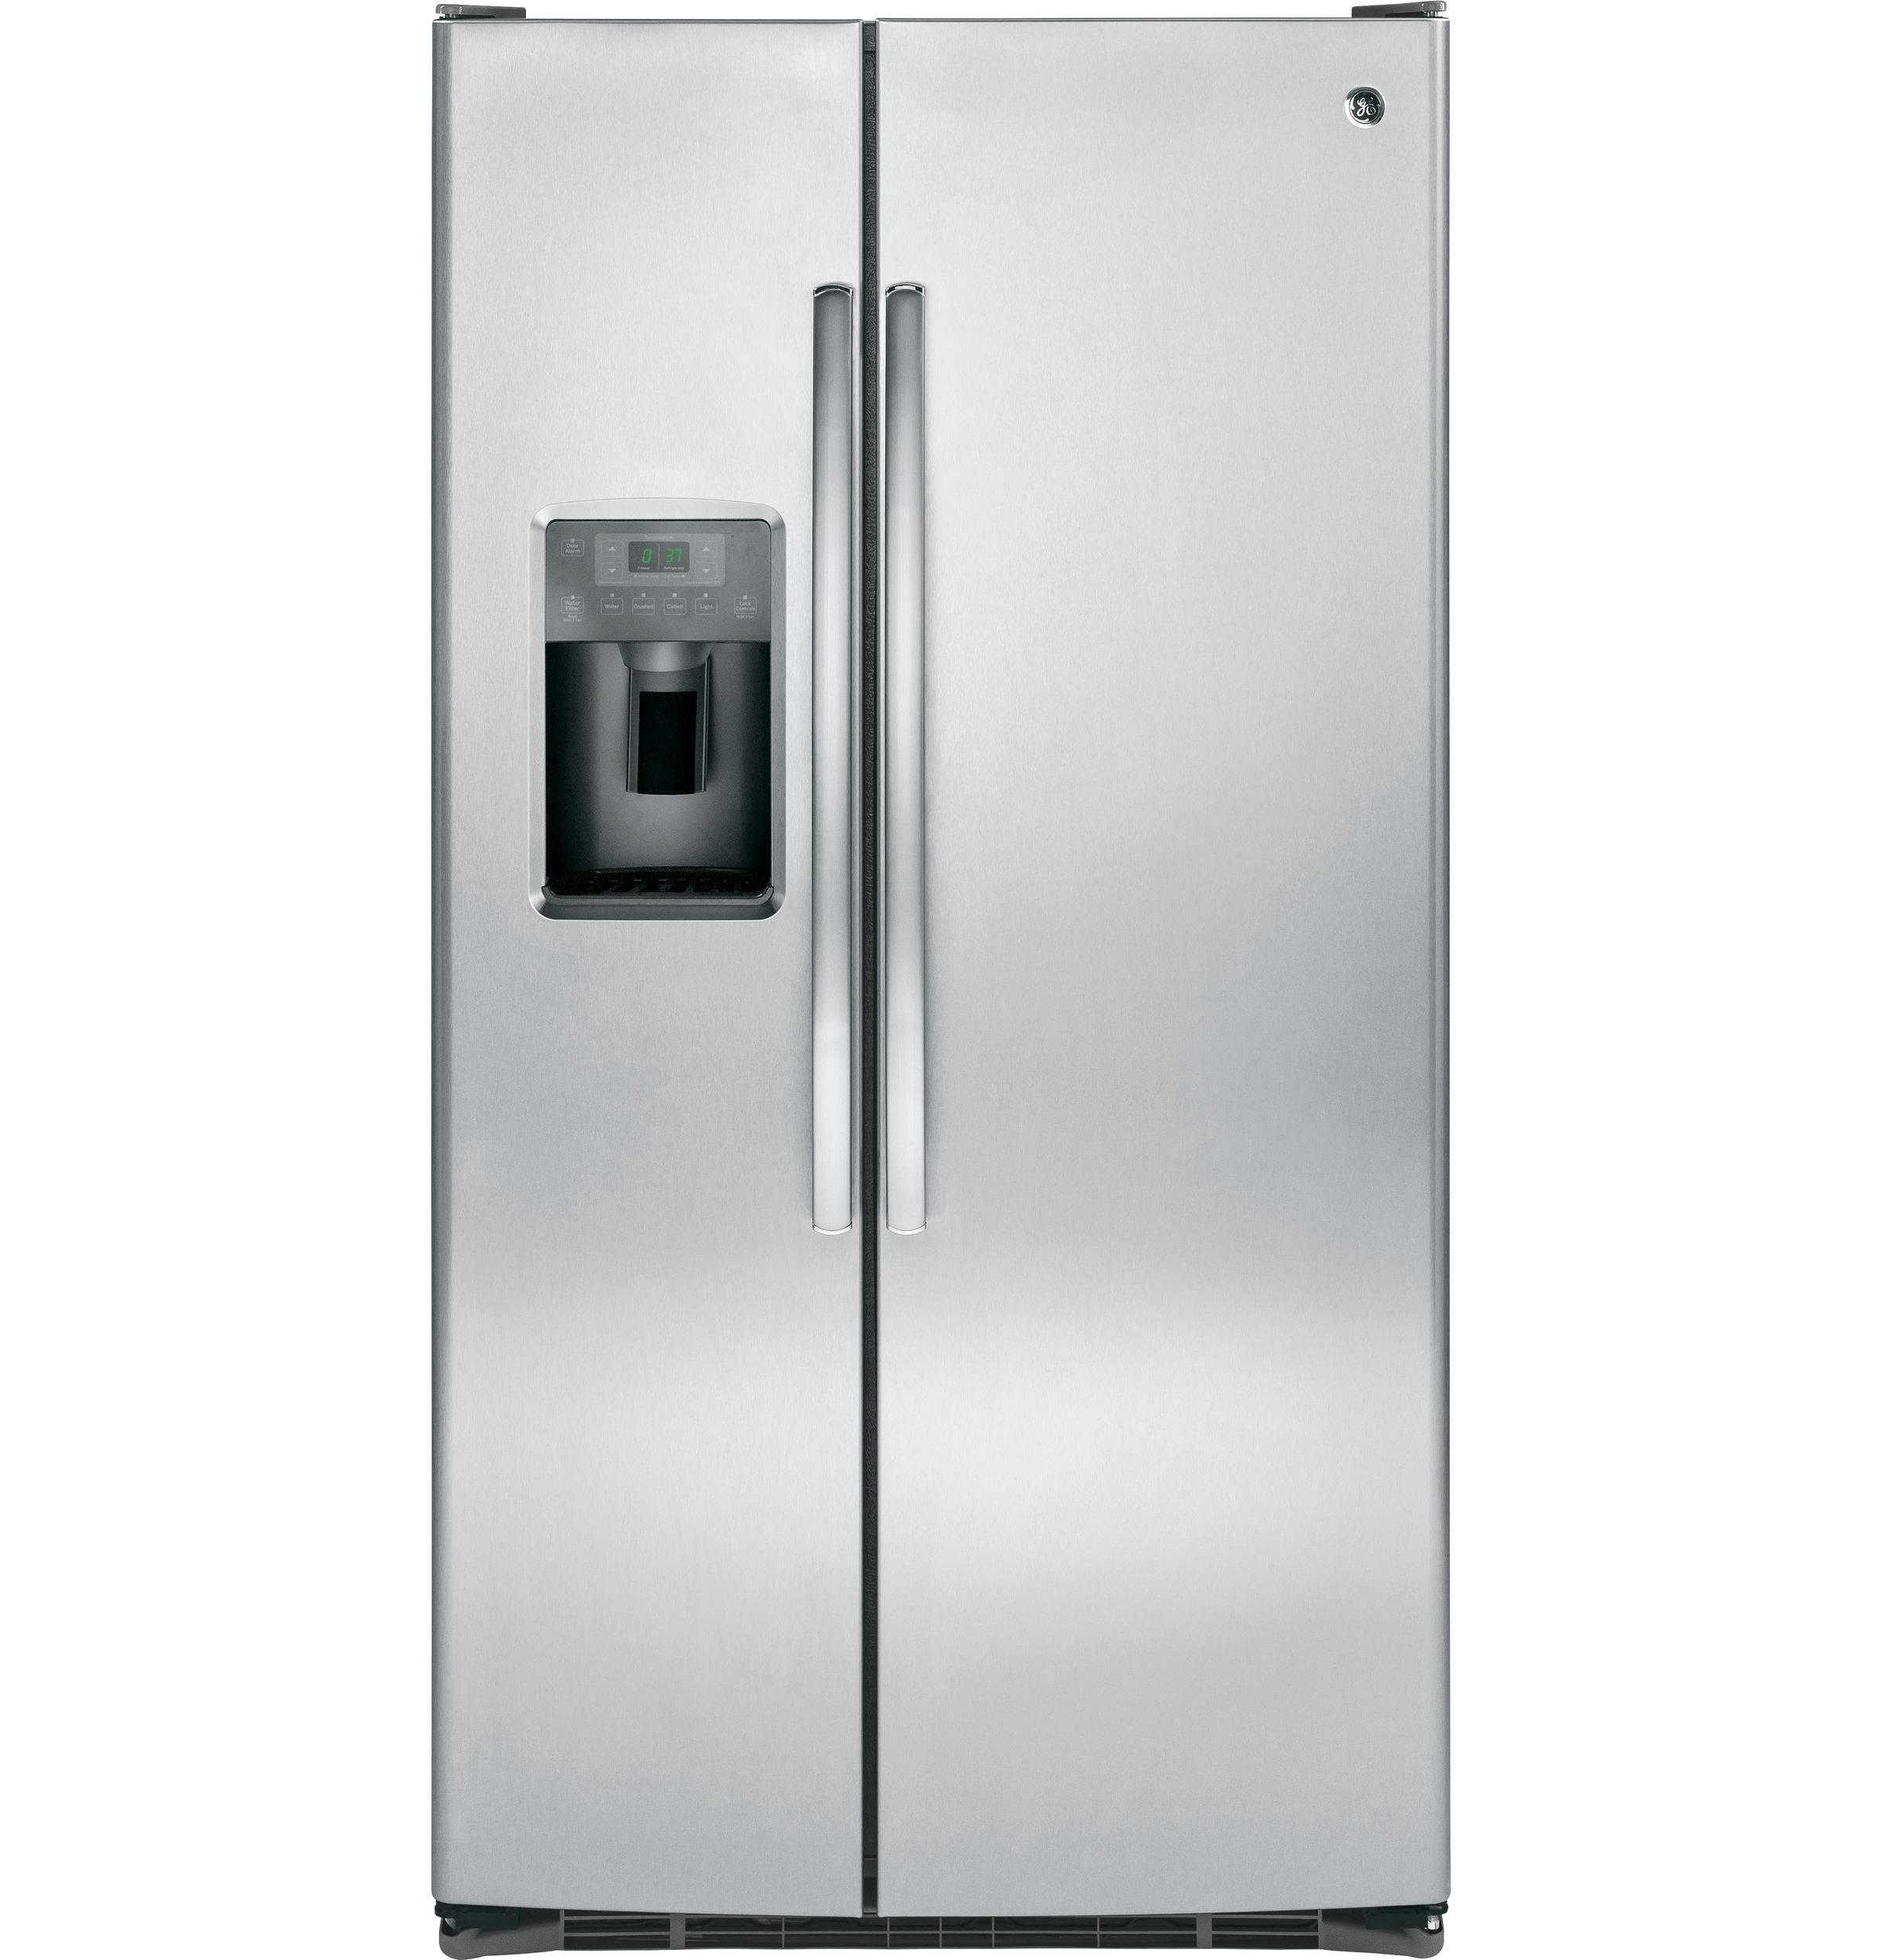 hight resolution of ge appliances gss25gshss 25 cu ft side by side refrigerator ge profile refrigerator parts list ge refrigerator water dispenser wiring diagram